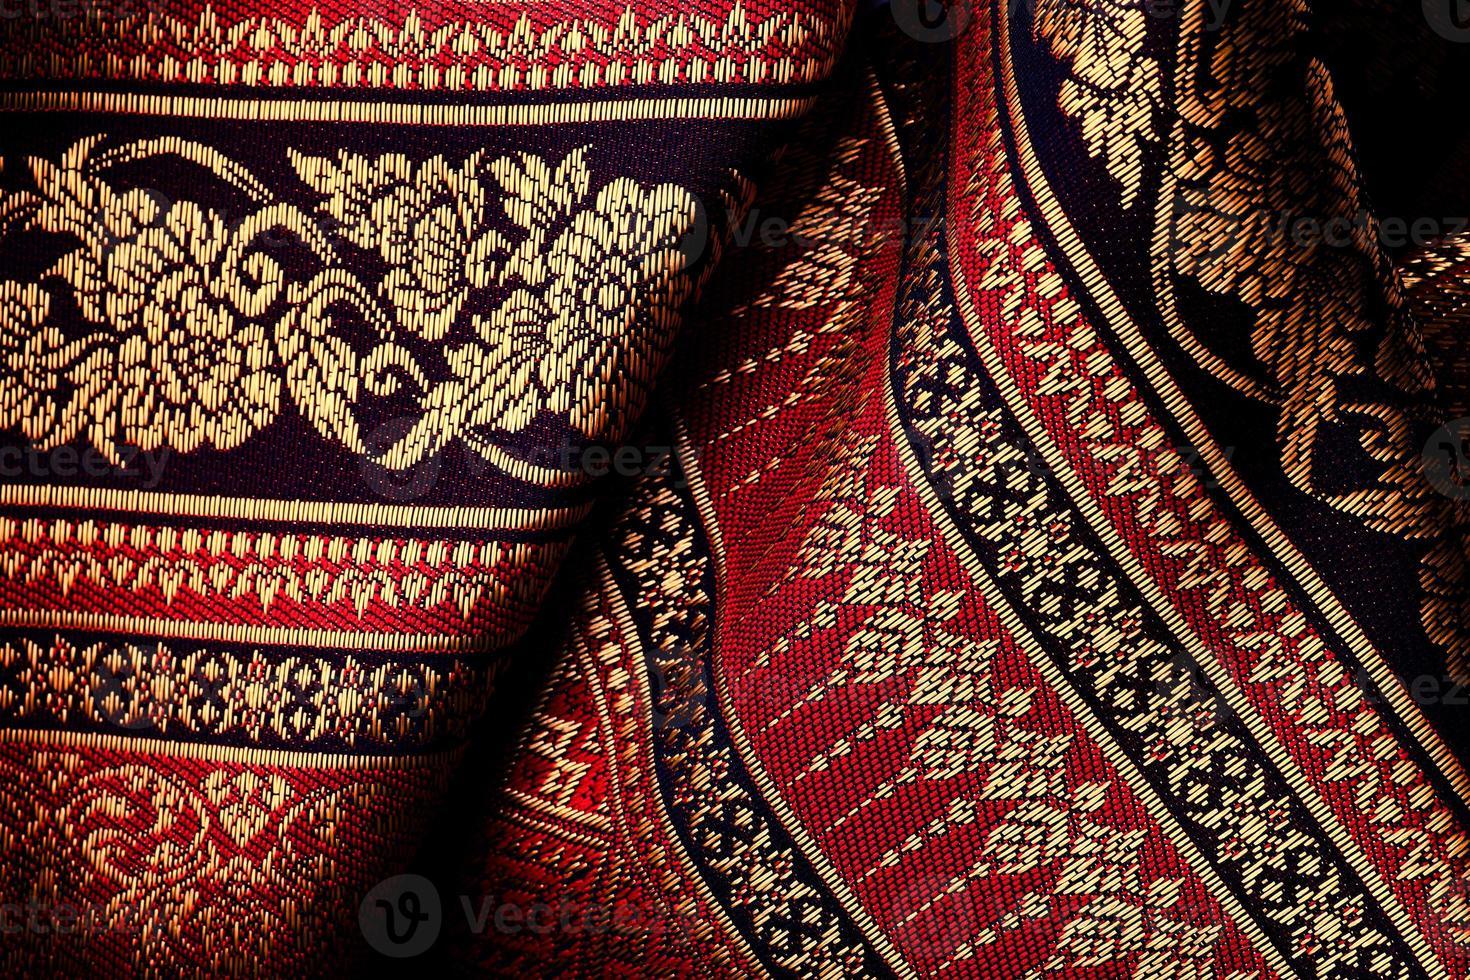 textil asiático antiguo foto